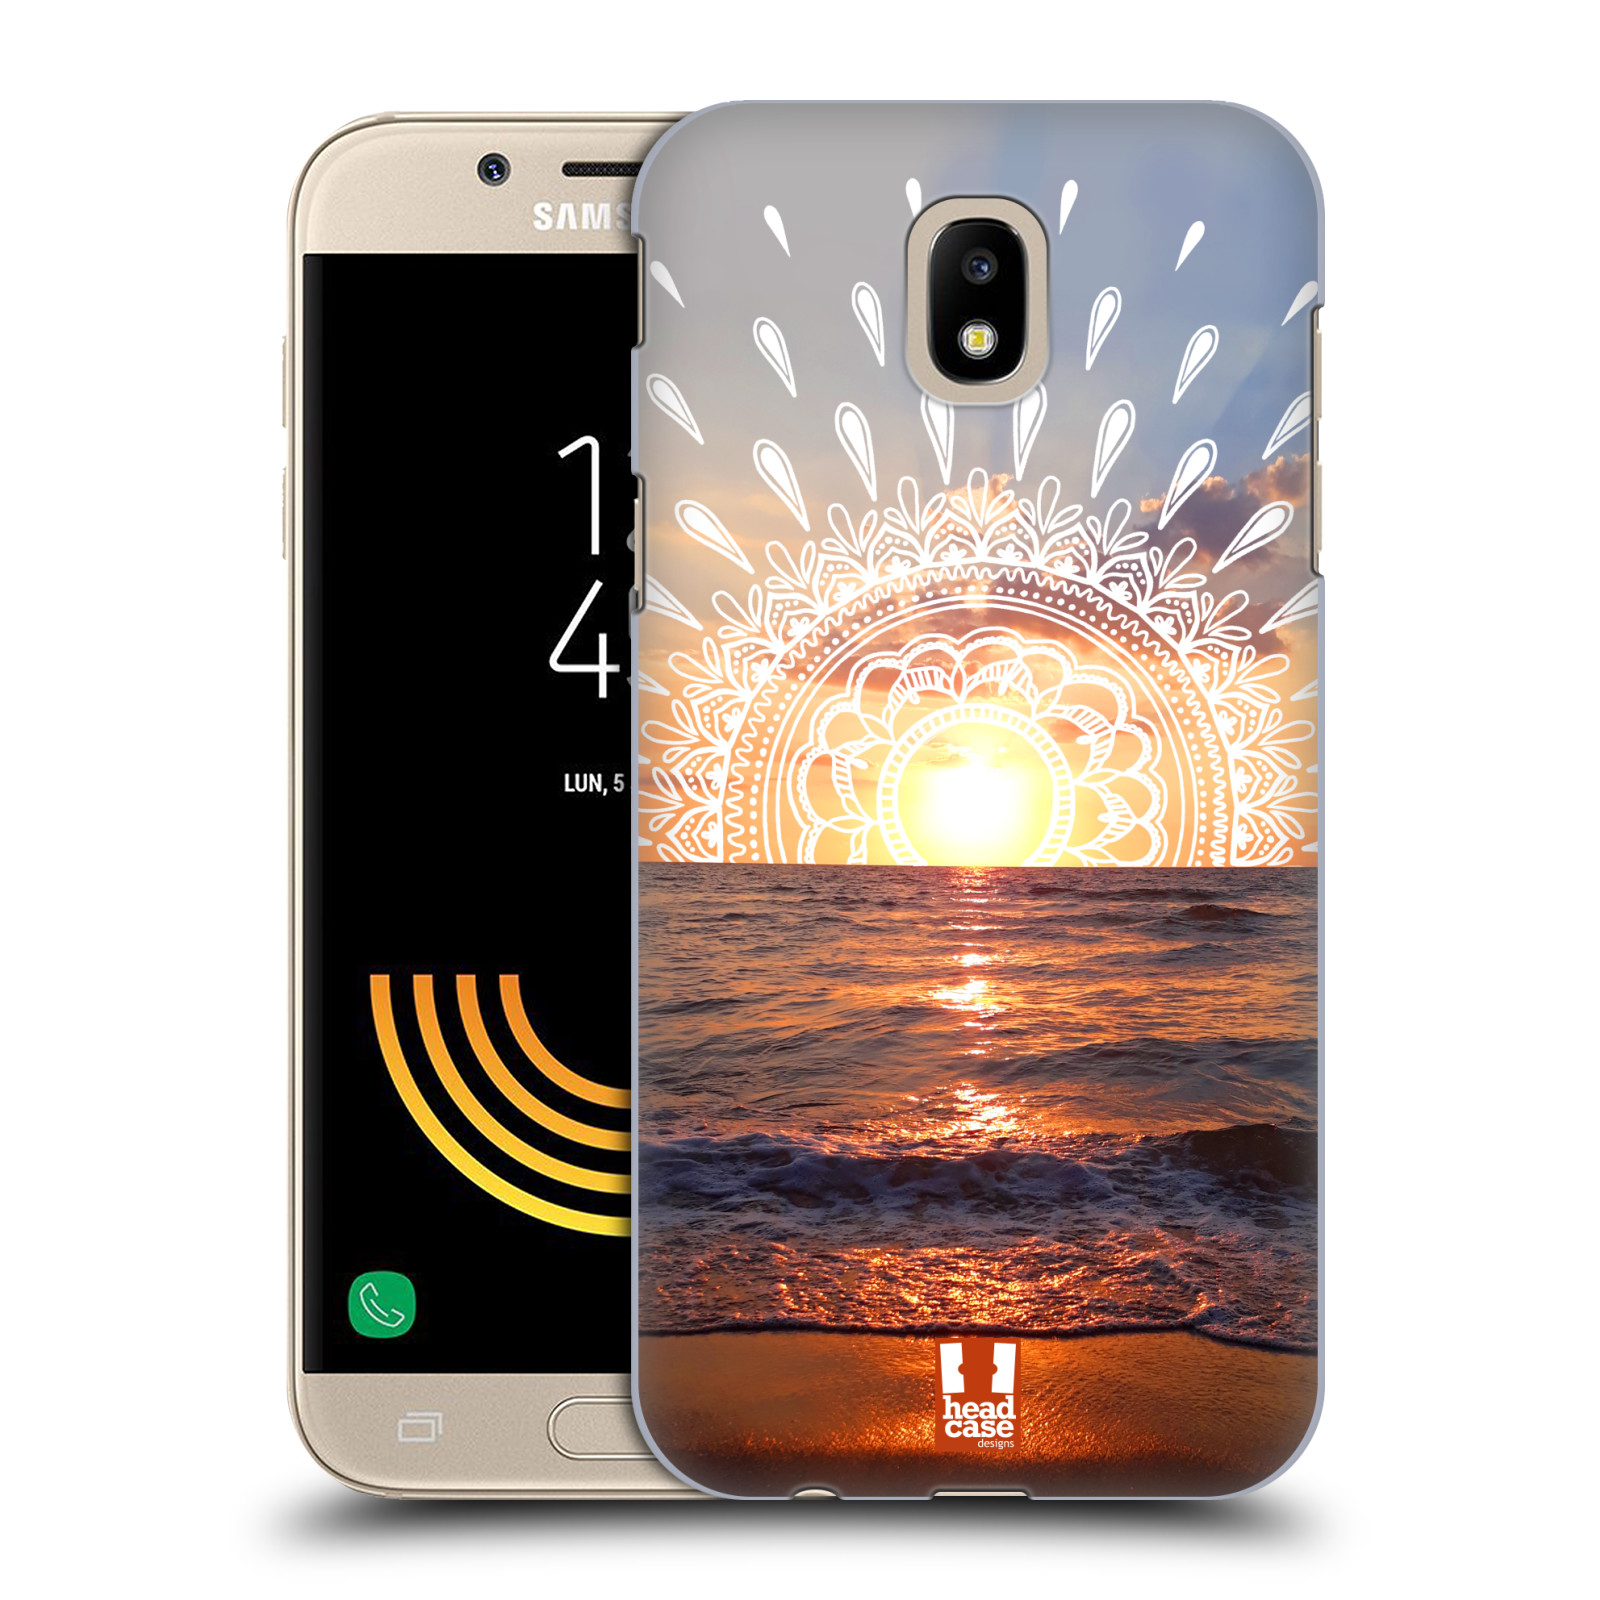 Pouzdro na mobil Samsung Galaxy J5 2017 - HEAD CASE - doodle západ slunce